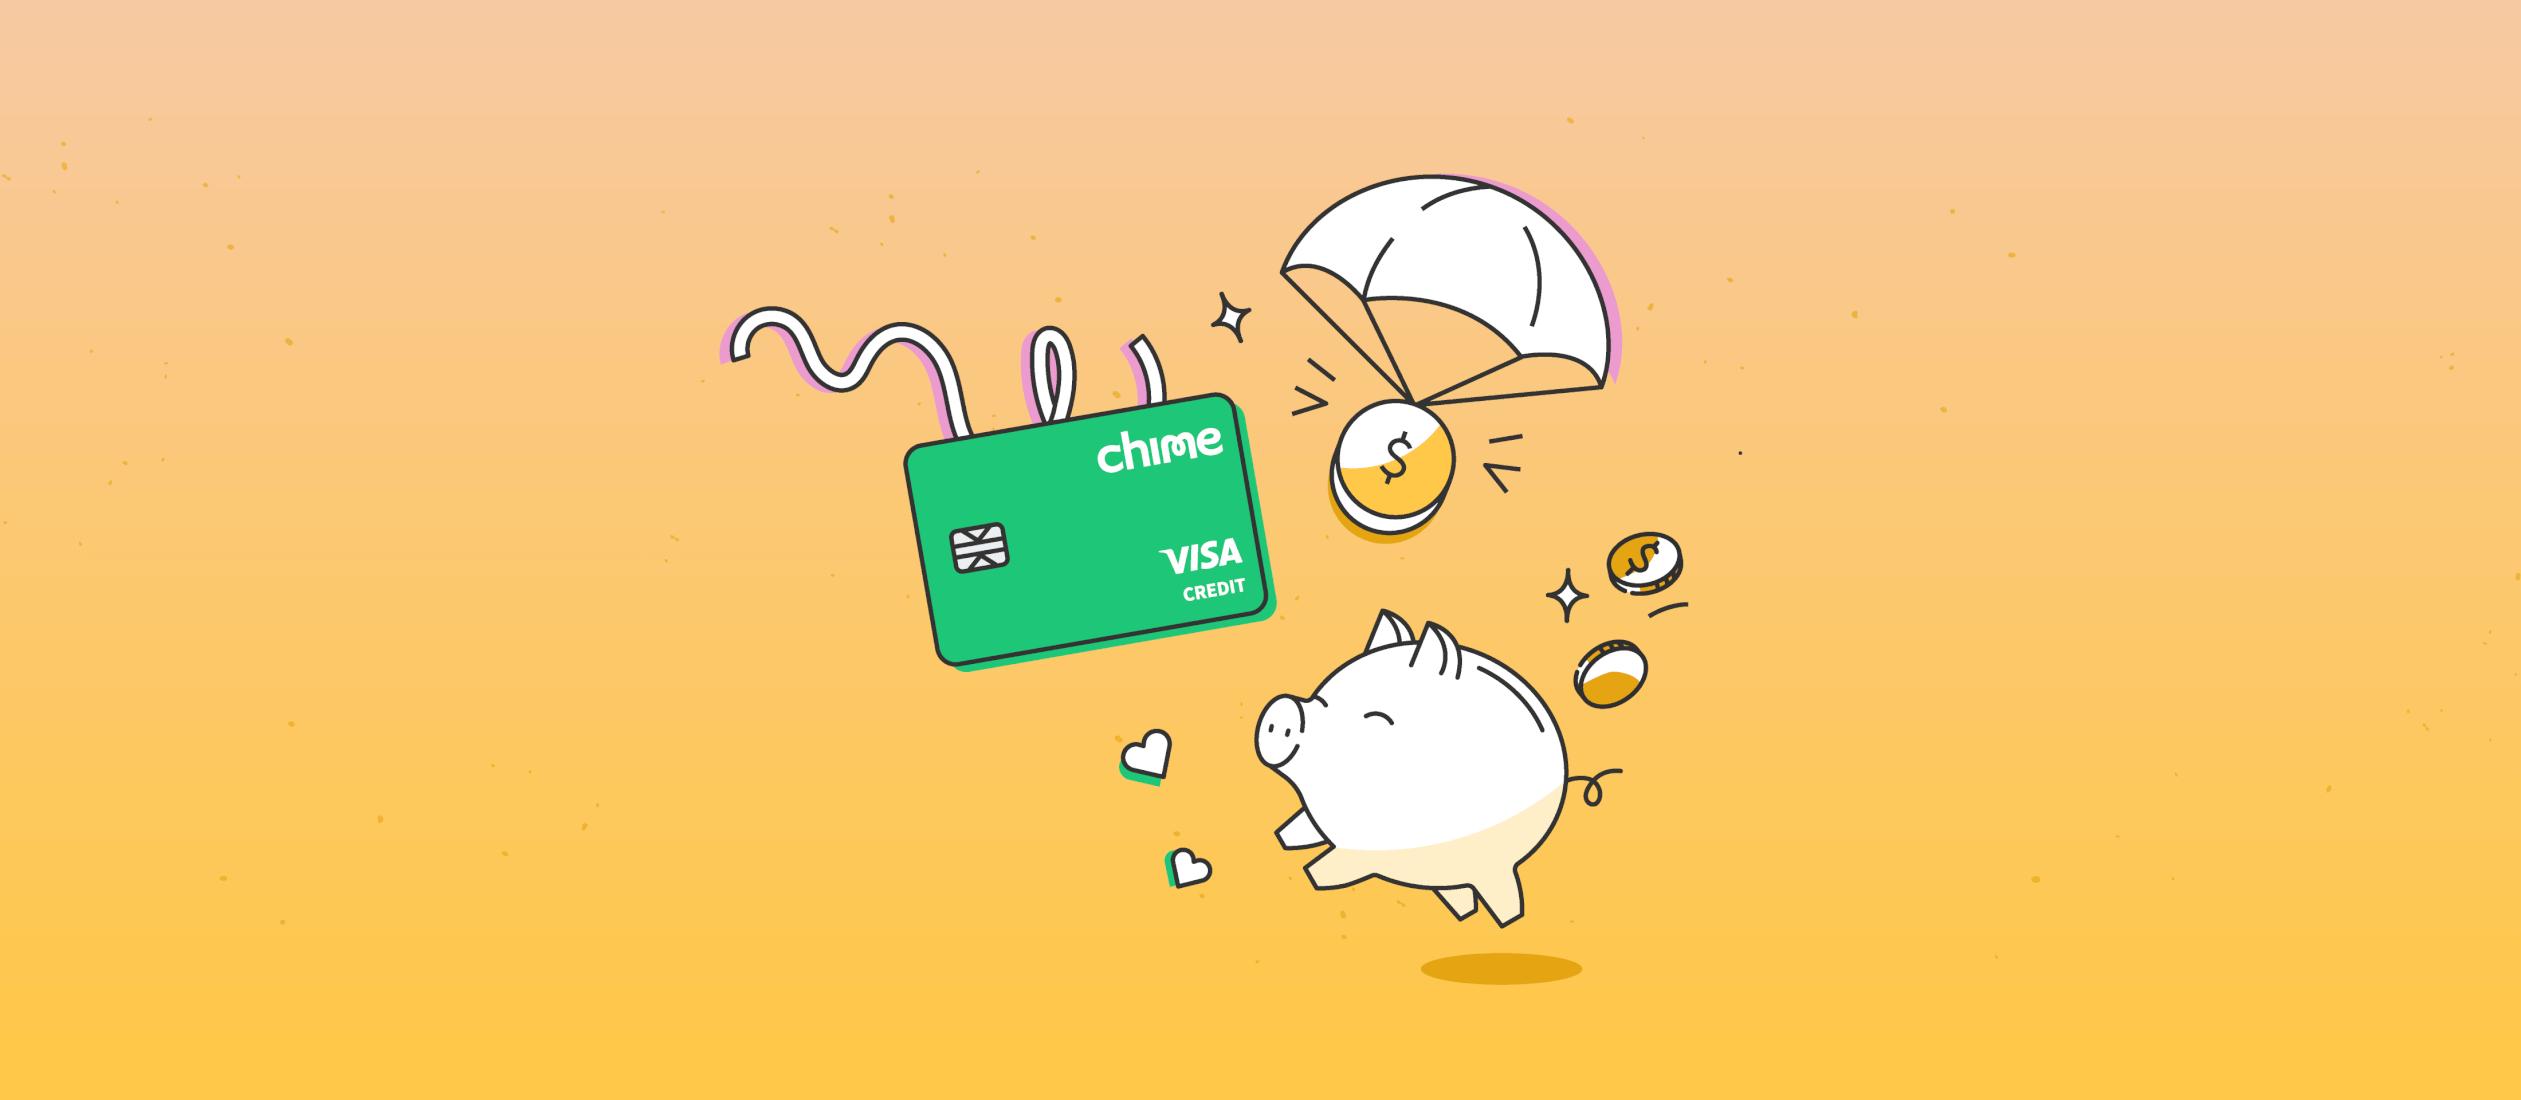 illustration of chime credit builder card, spotme logo and piggy bank